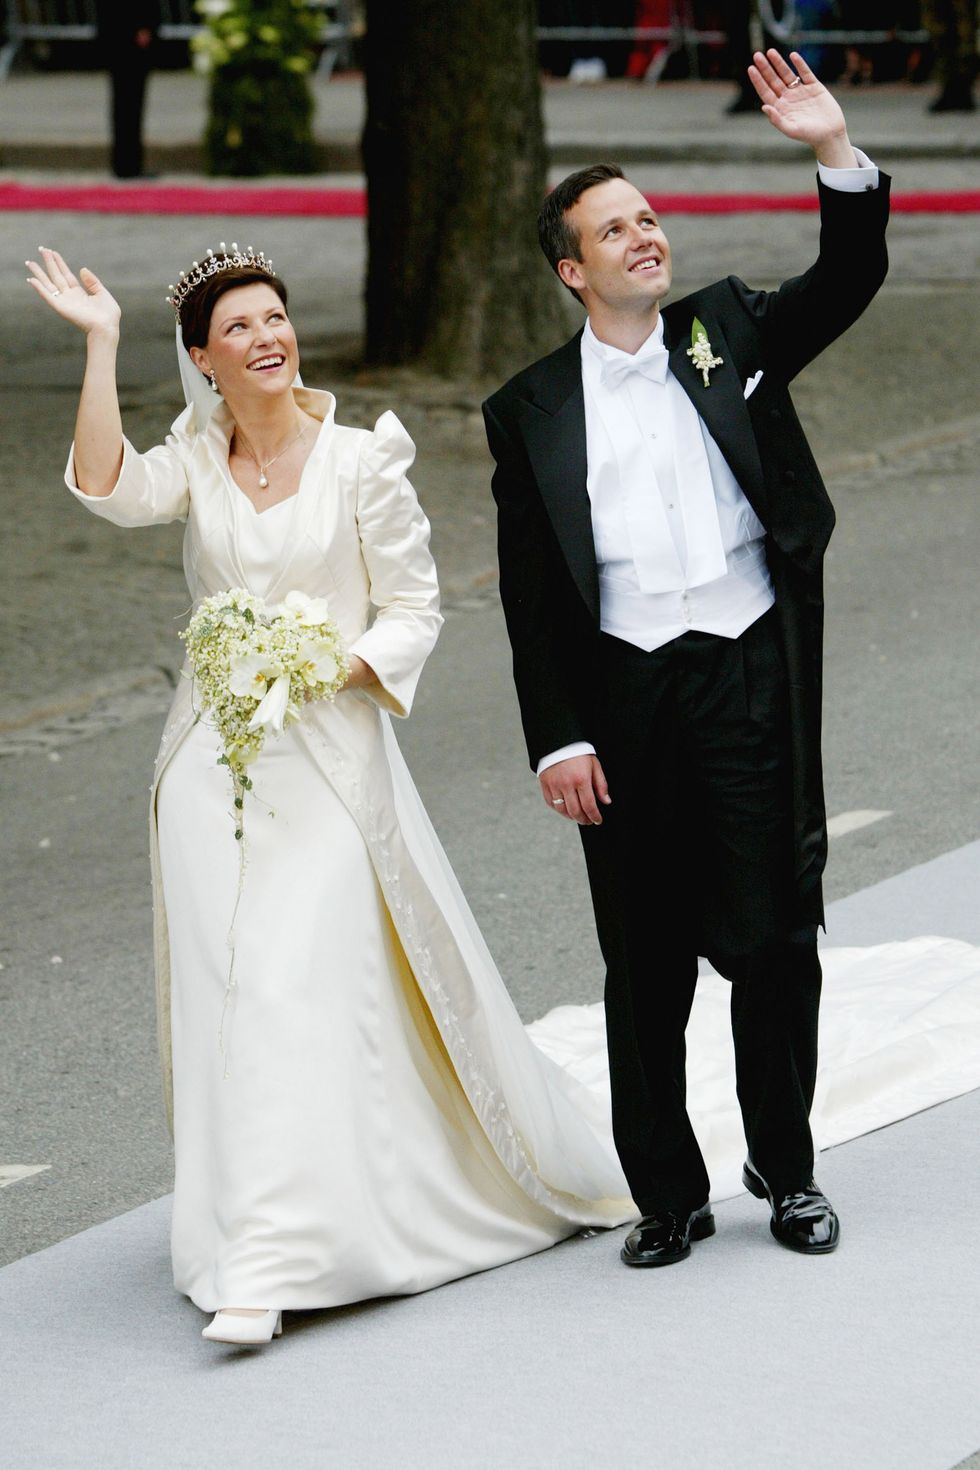 Princess Martha-Louise & Ari Behn of Norway